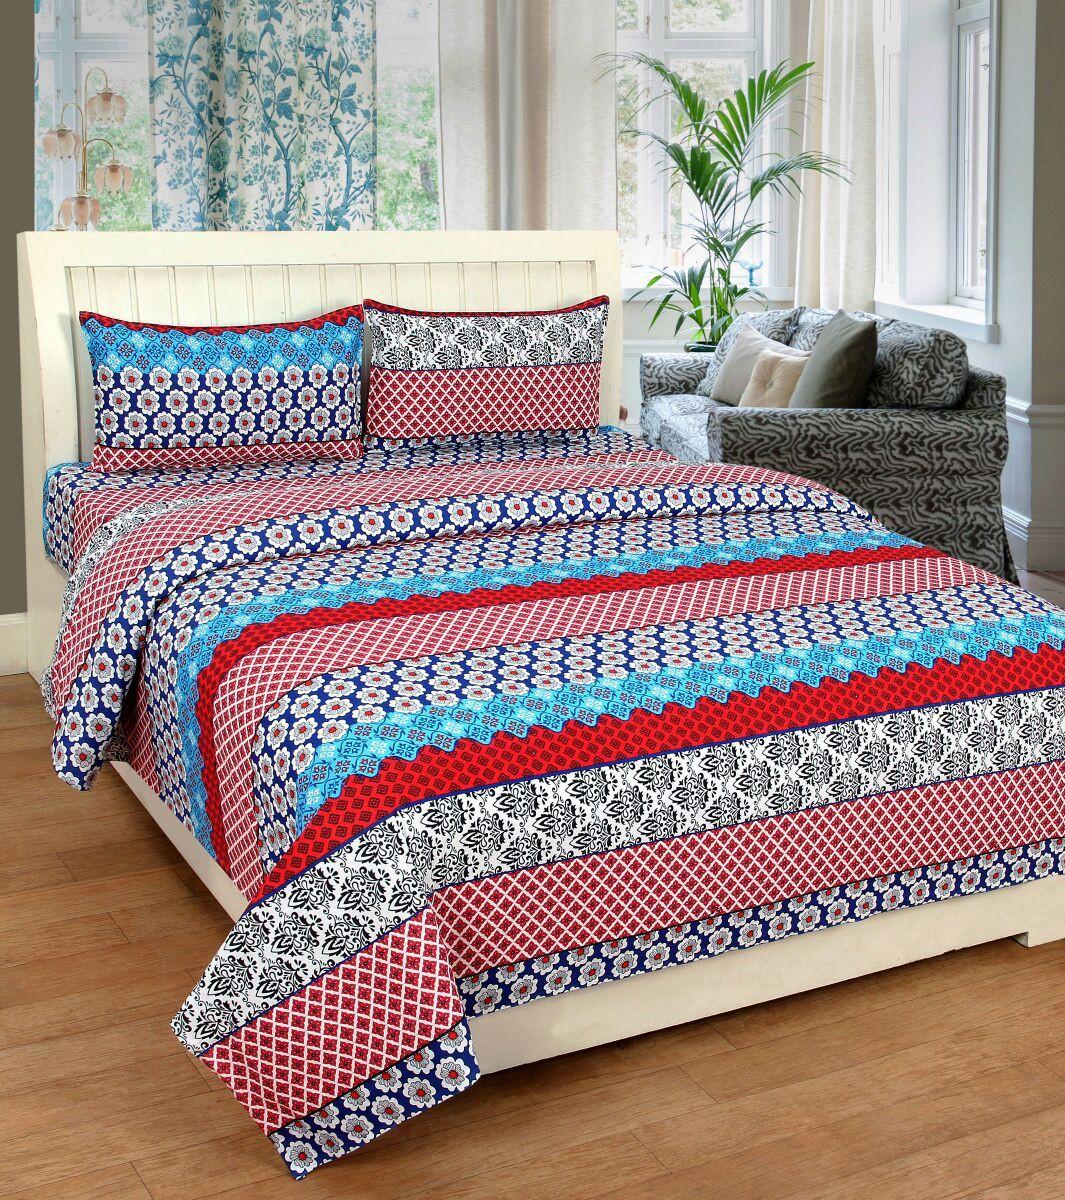 Zain Cotton Self Design Queen sized Double Bedsheet(1 QUEEN SIZE BED SHEET, 2 PILLOW COVERS, MULTI COLOUR)